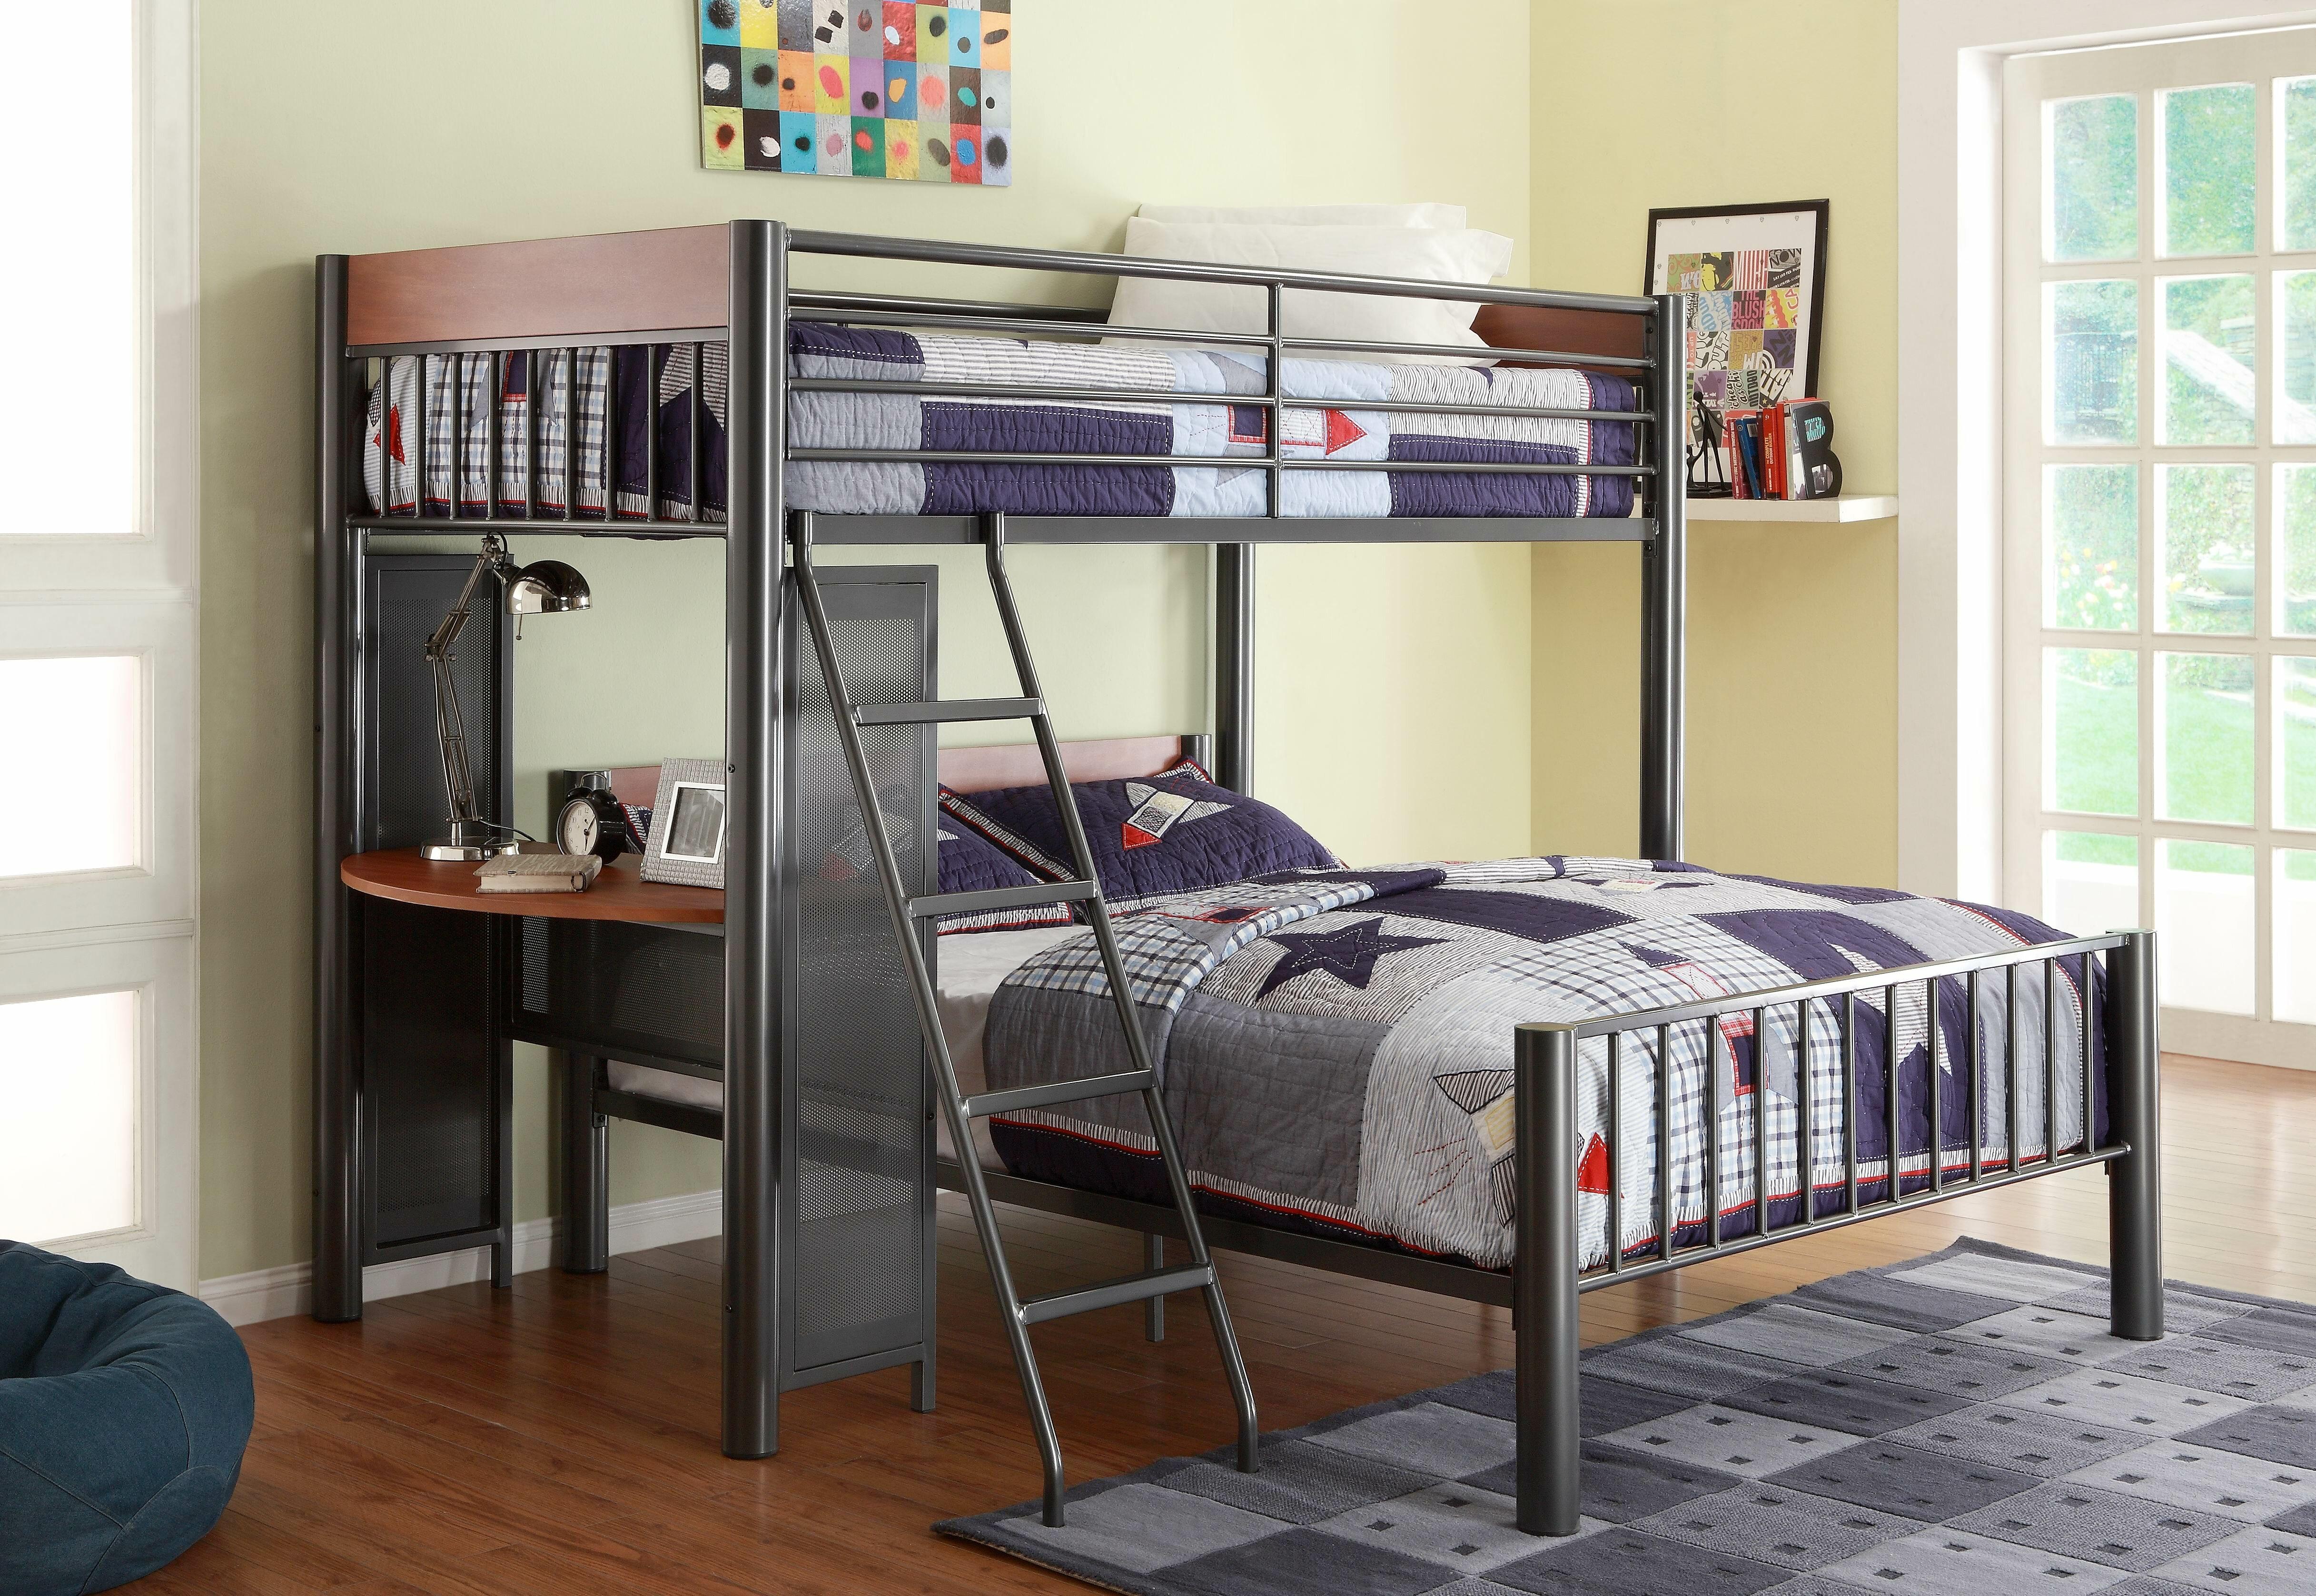 Harriet Bee Twyla Twin Over Full Metal L Shaped Bunk Beds With Built In Desk By Harriet Bee Reviews Wayfair